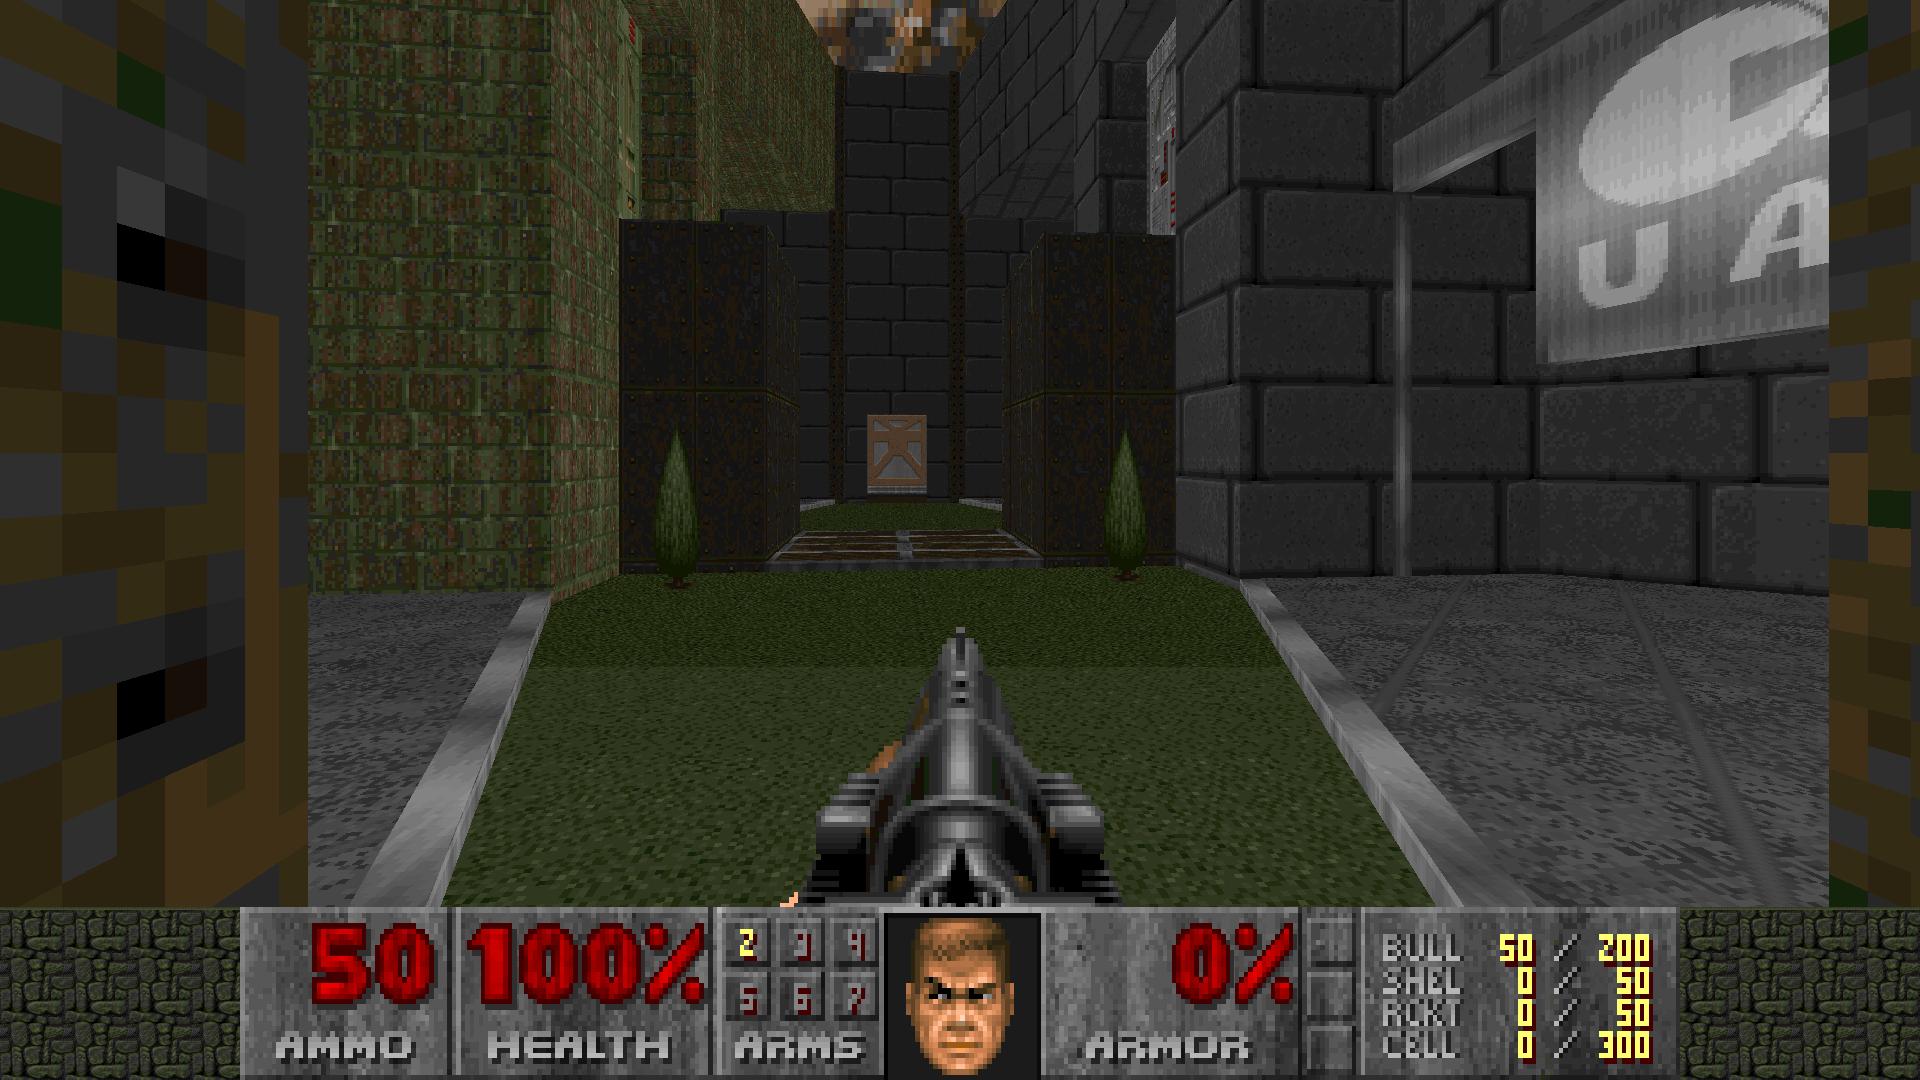 Screenshot_Doom_20201112_233123.png.eefea129da00ffb751ace5c0c37be120.png